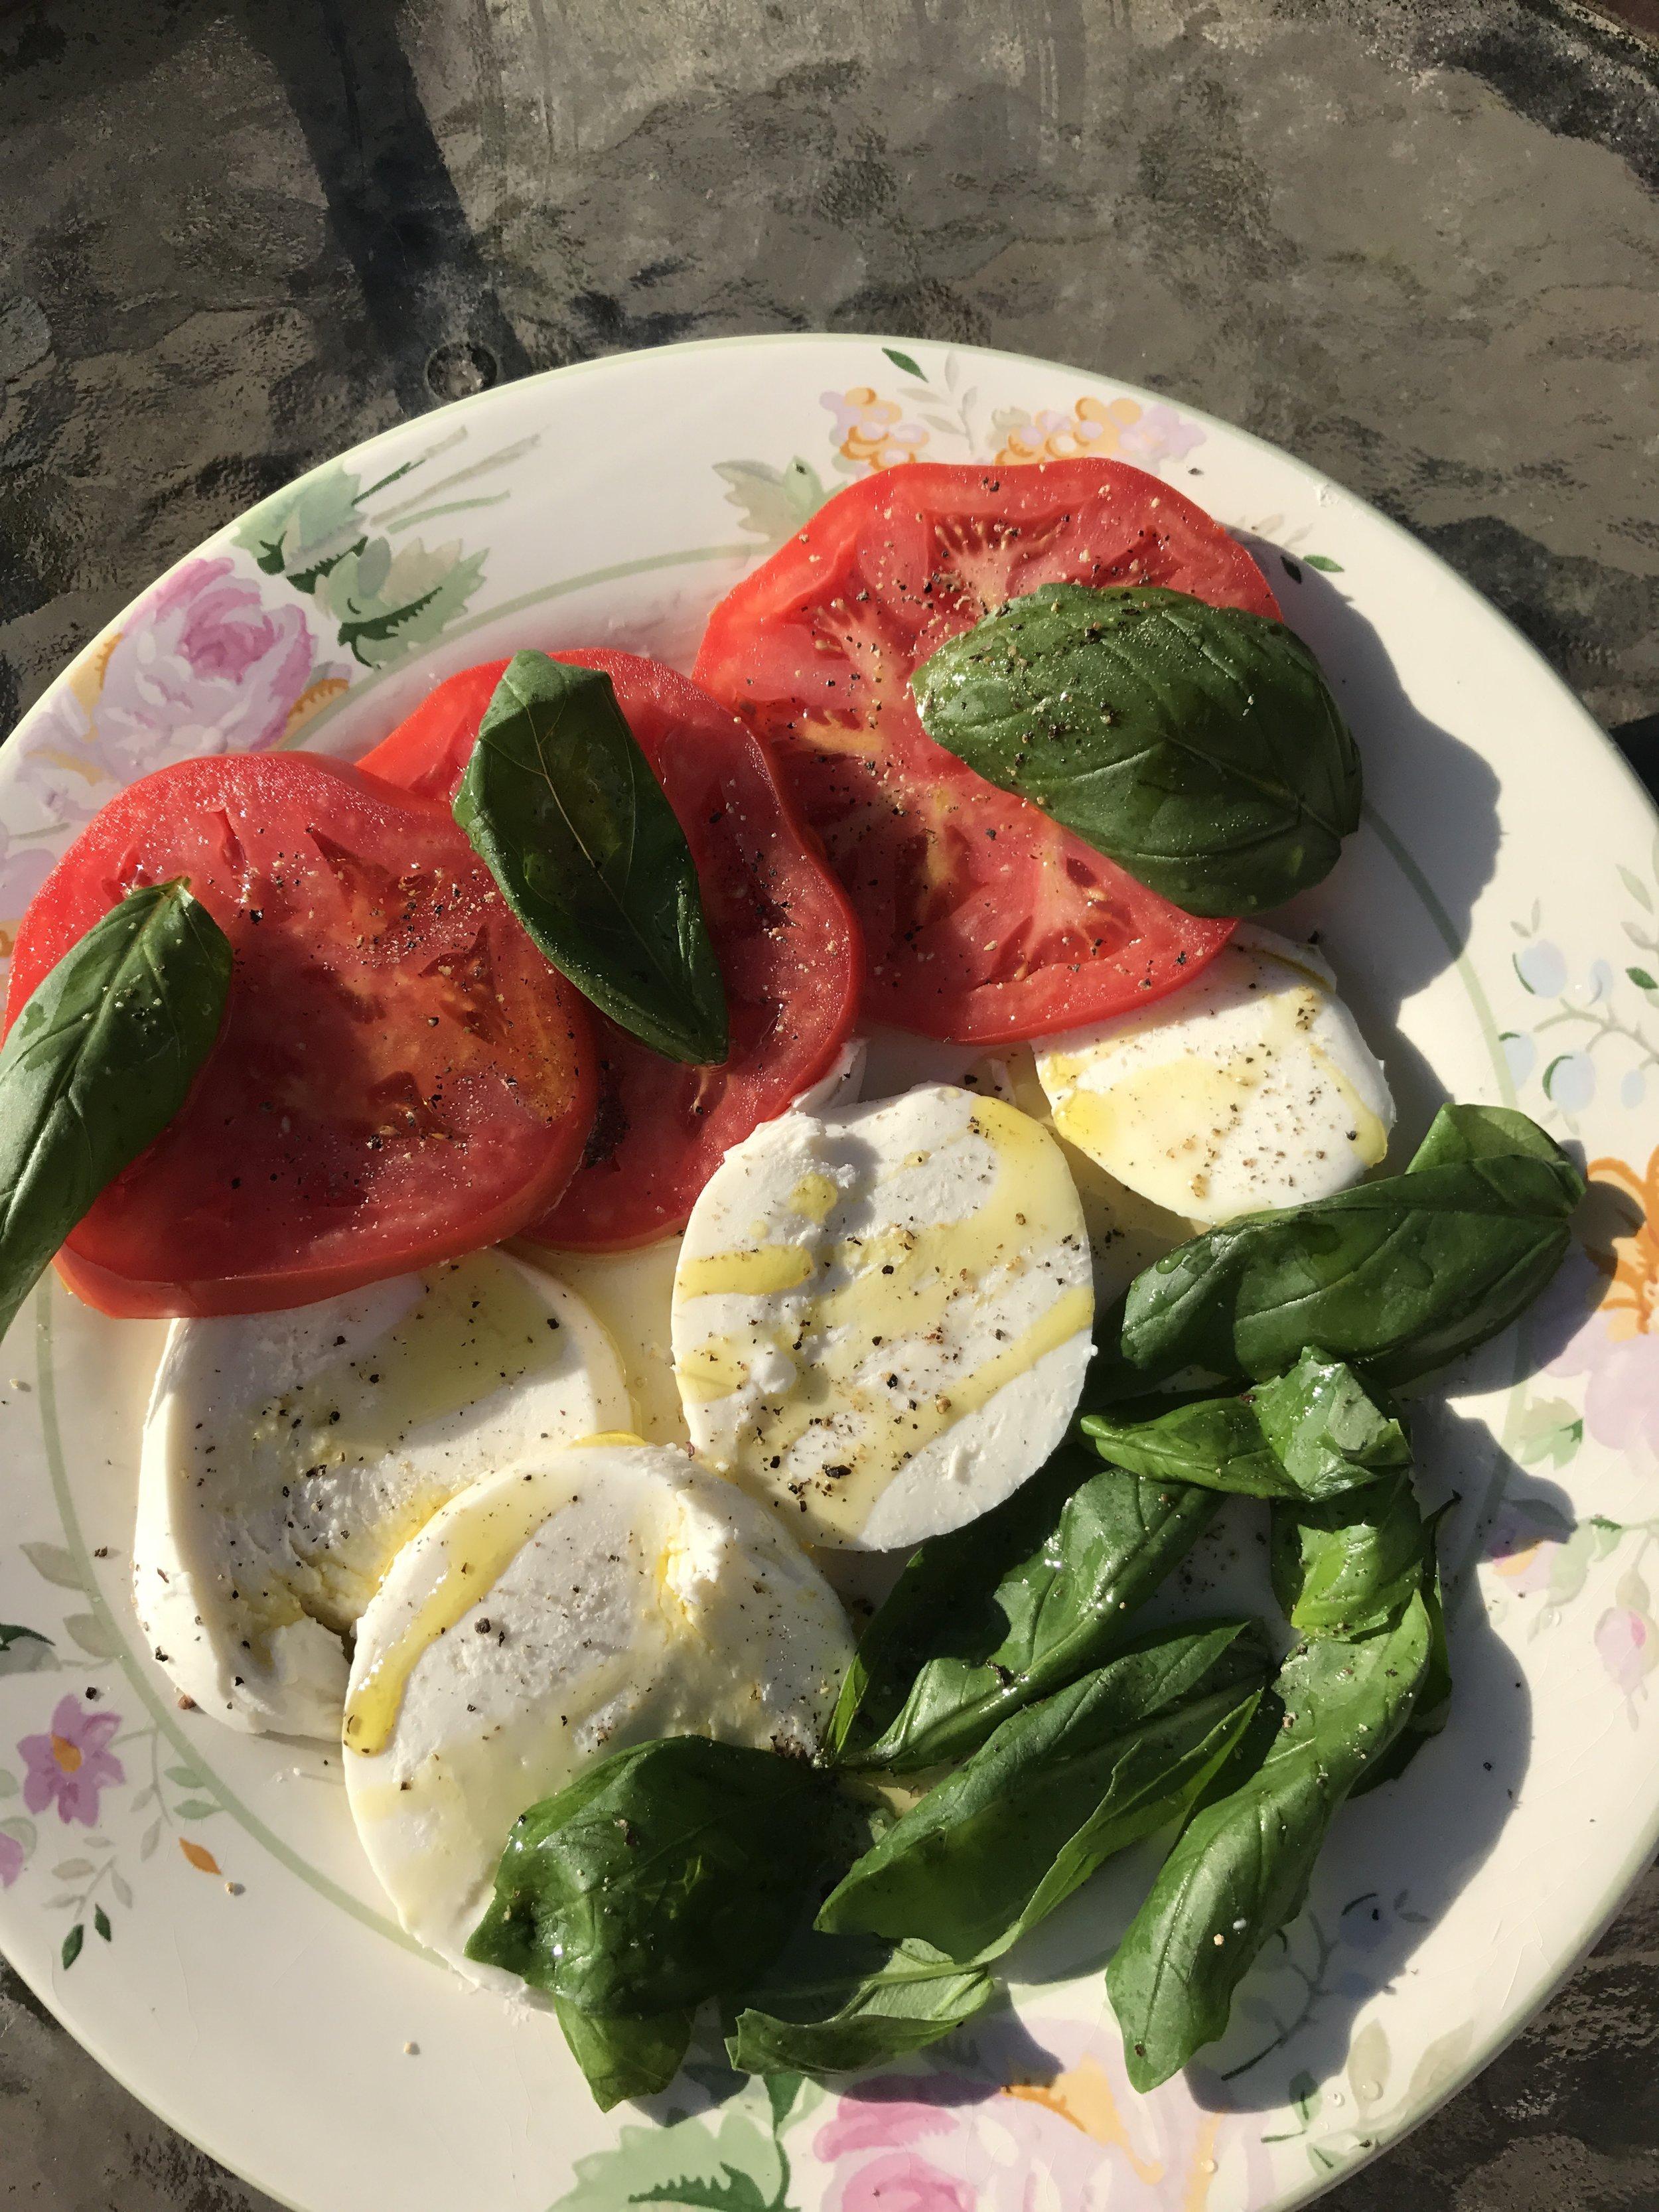 caprese-salad-slicetomatos-slicedmozzarella-freshbasil-now-drizzleoveryourfavoriteevoofromolivinsandagedbalsamicreductionbilllikesevoofromspainandrosieparksbalsamic.JPG